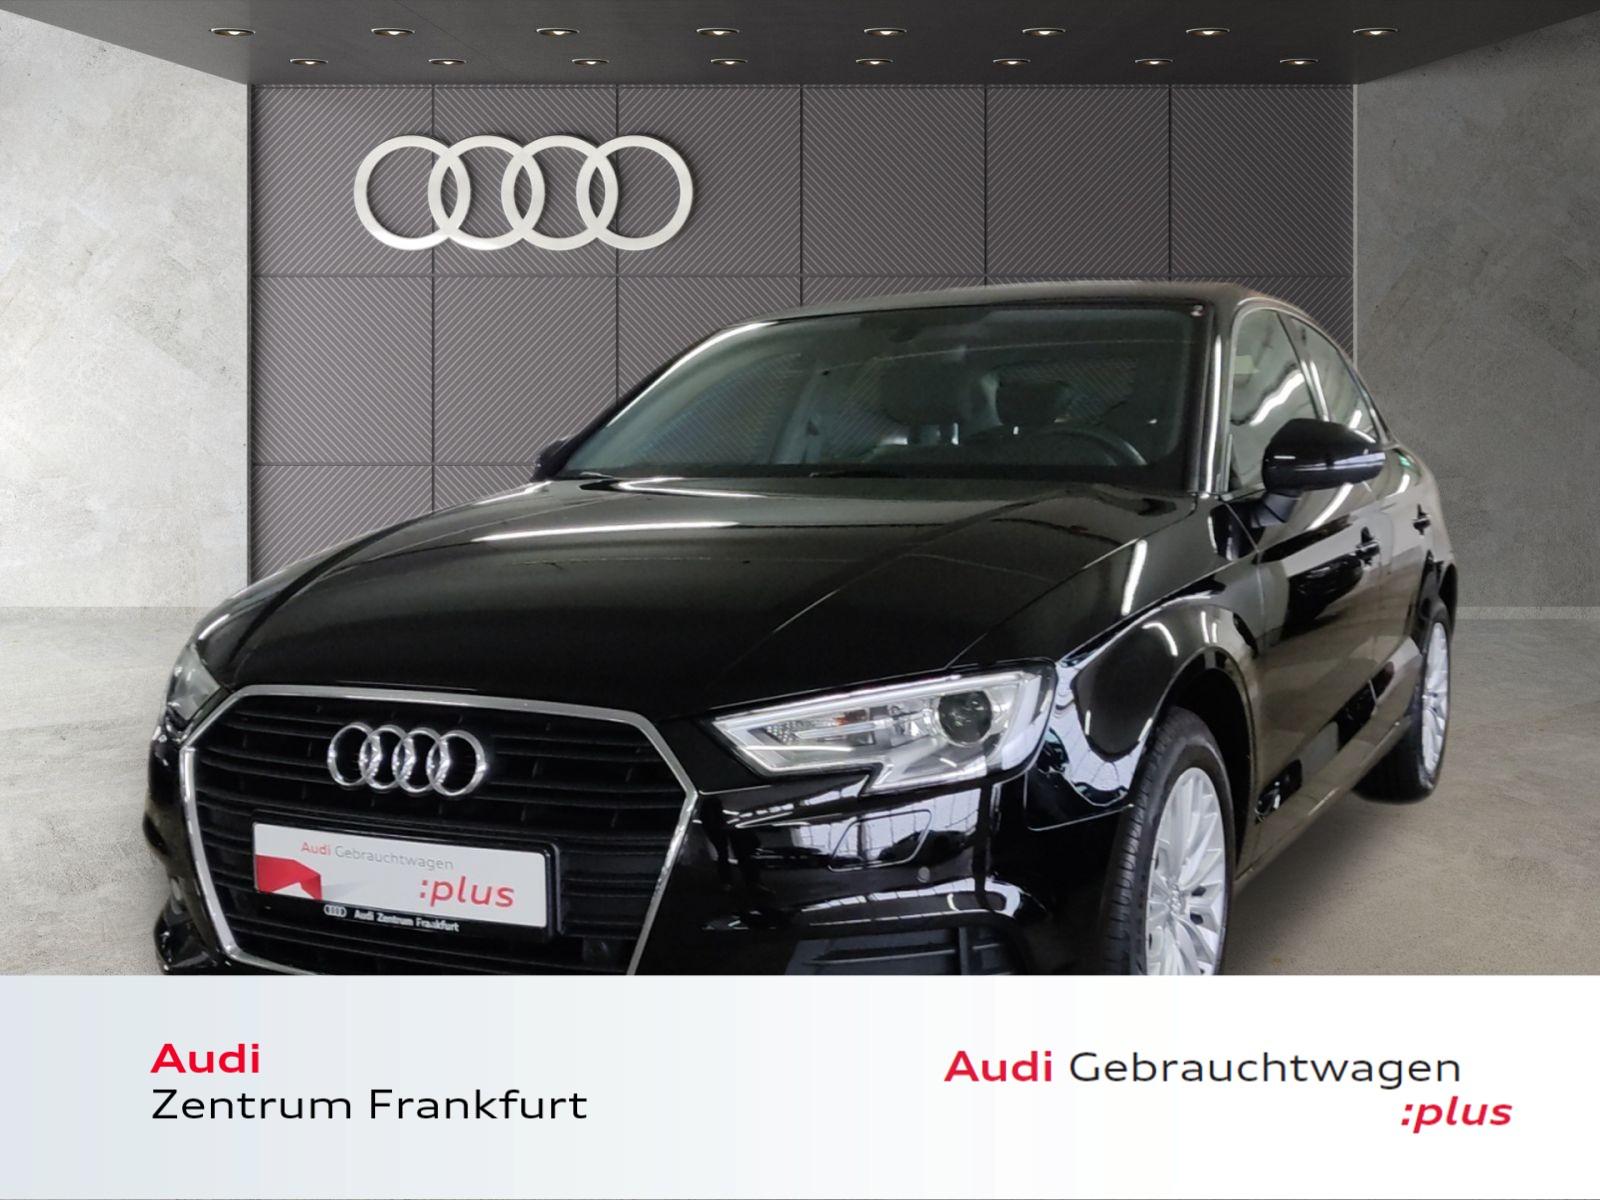 Audi A3 Limousine 1.6 TDI S tronic Xenon Navi PDC Sitzheizung Bluetooth, Jahr 2018, Diesel